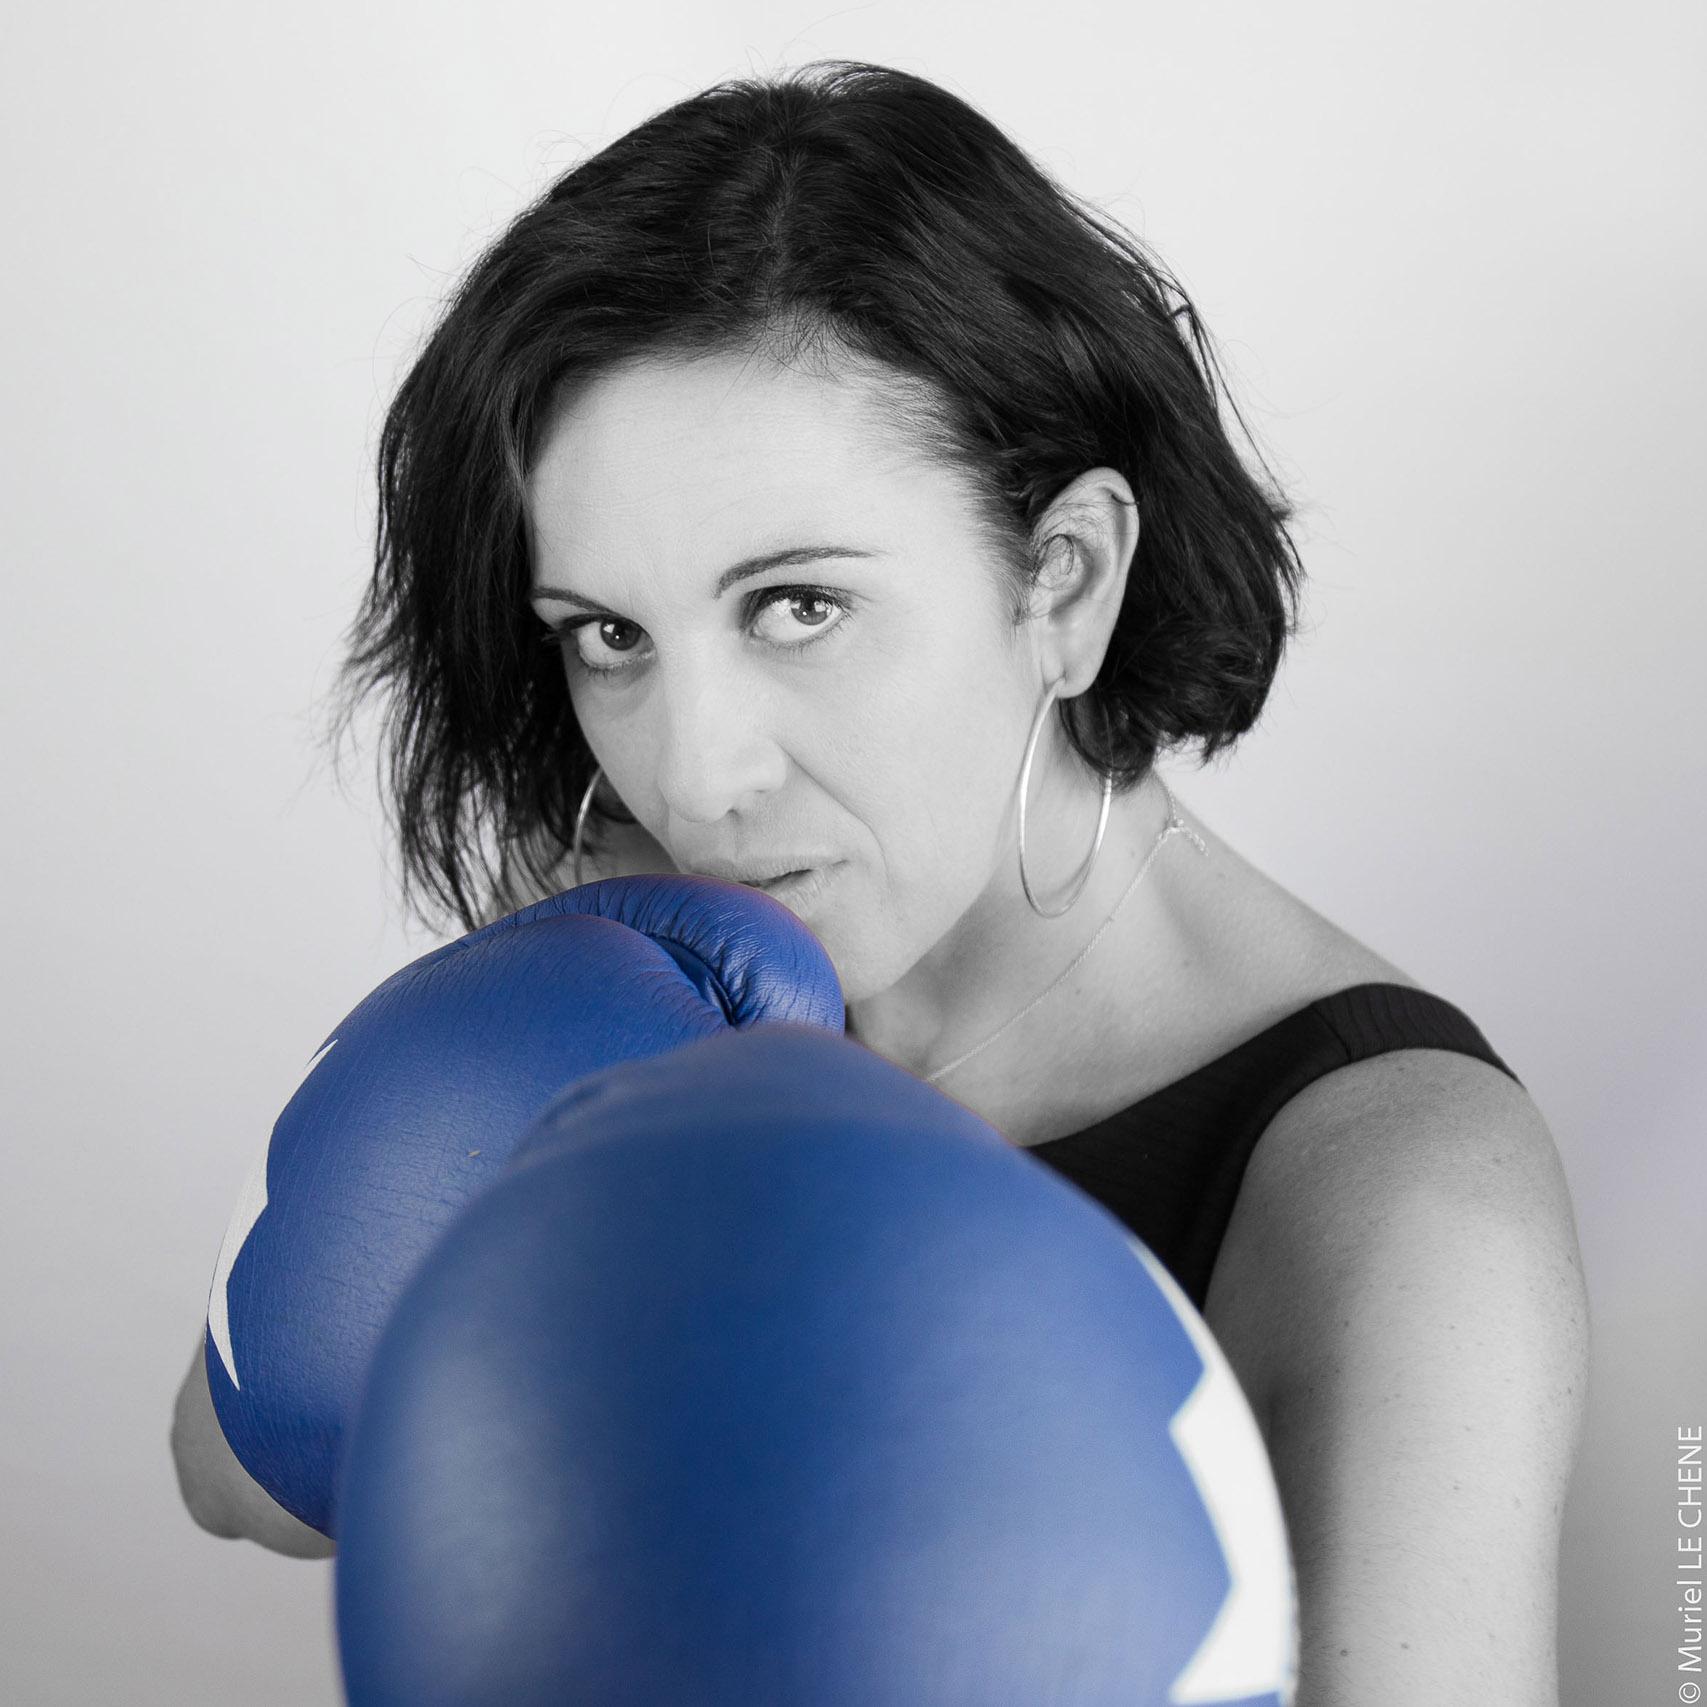 photographe-professionnel-presse-vannes-morbihan-bretagne-lorient